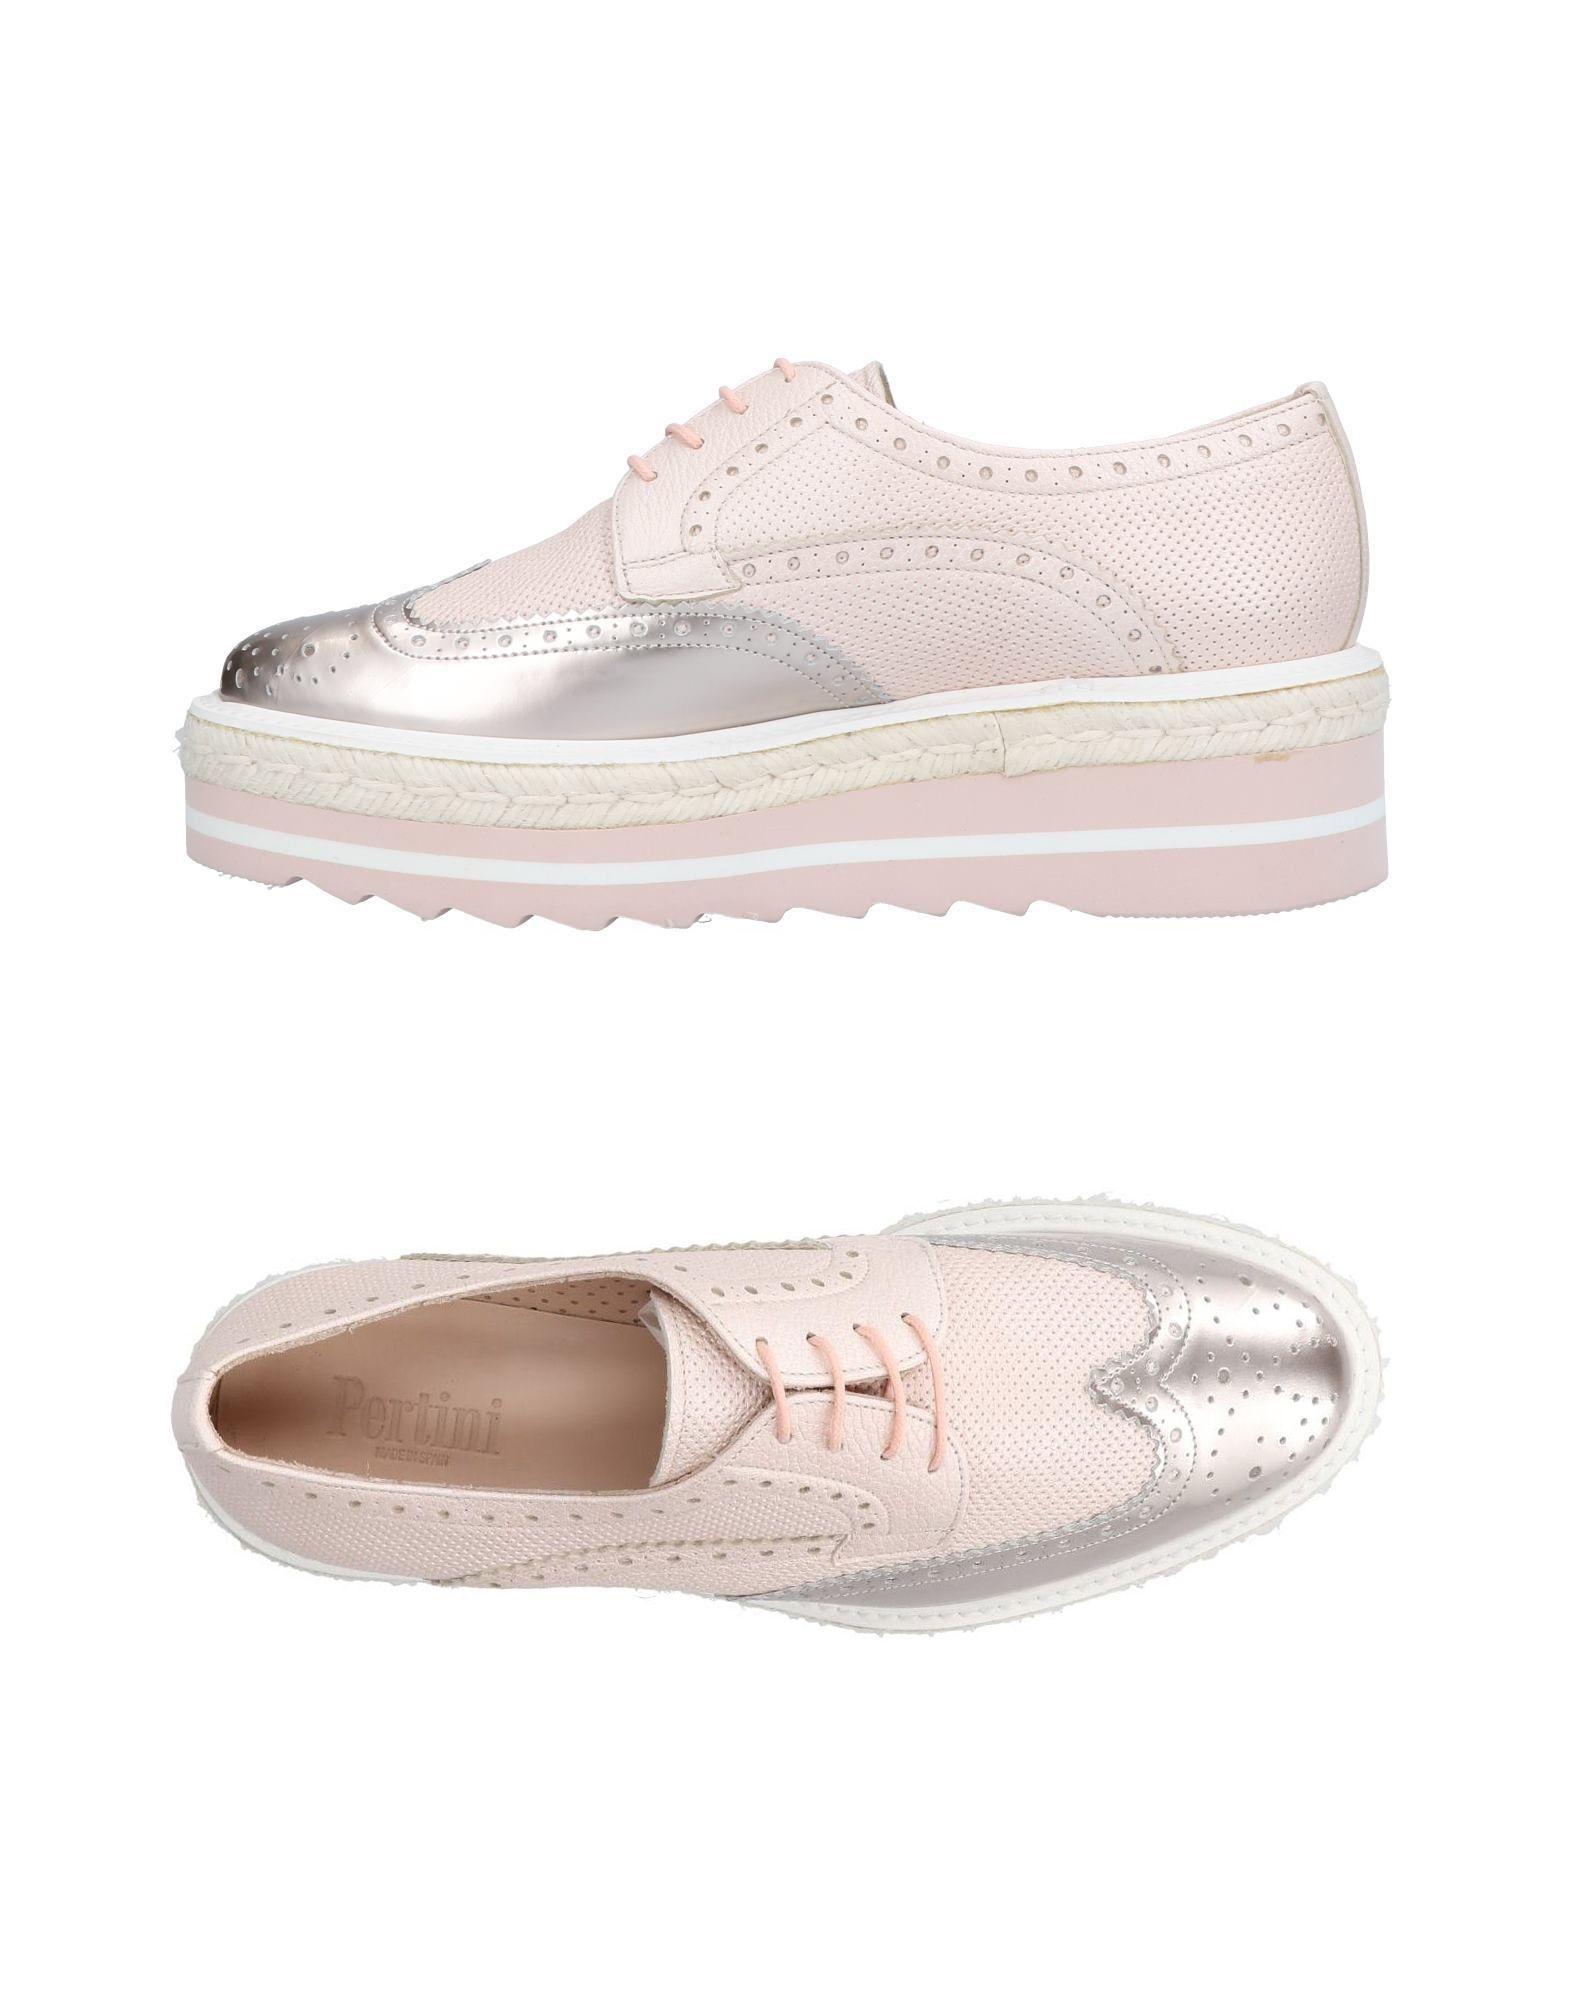 Pertini Schnürschuhe Damen  11458511MS Gute Qualität beliebte Schuhe